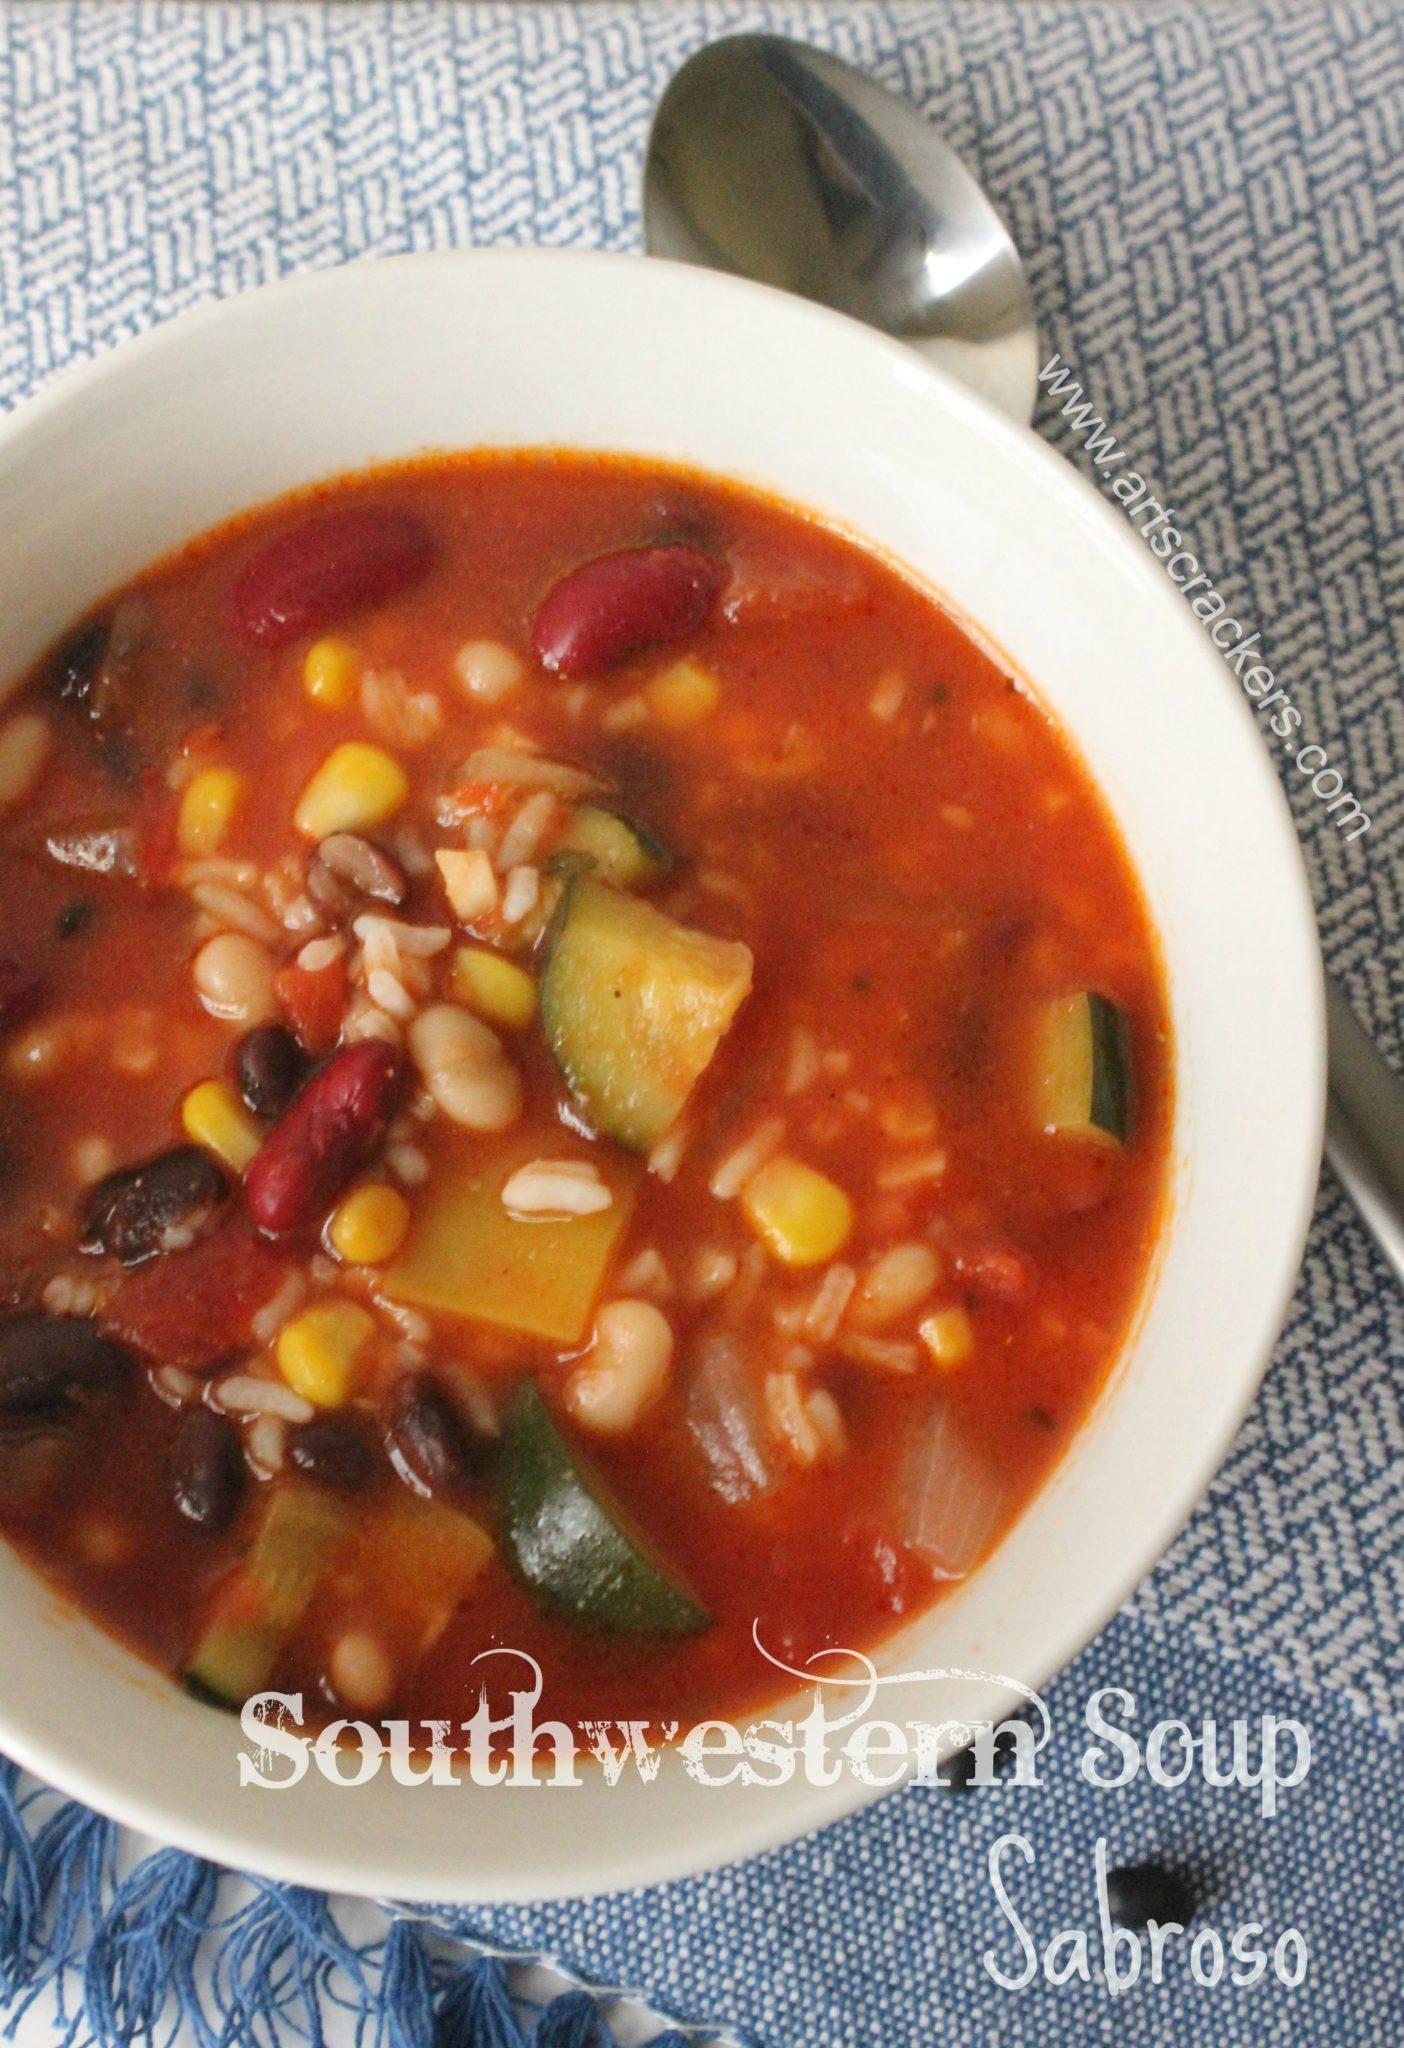 Southwestern Soup Sabroso Recipe